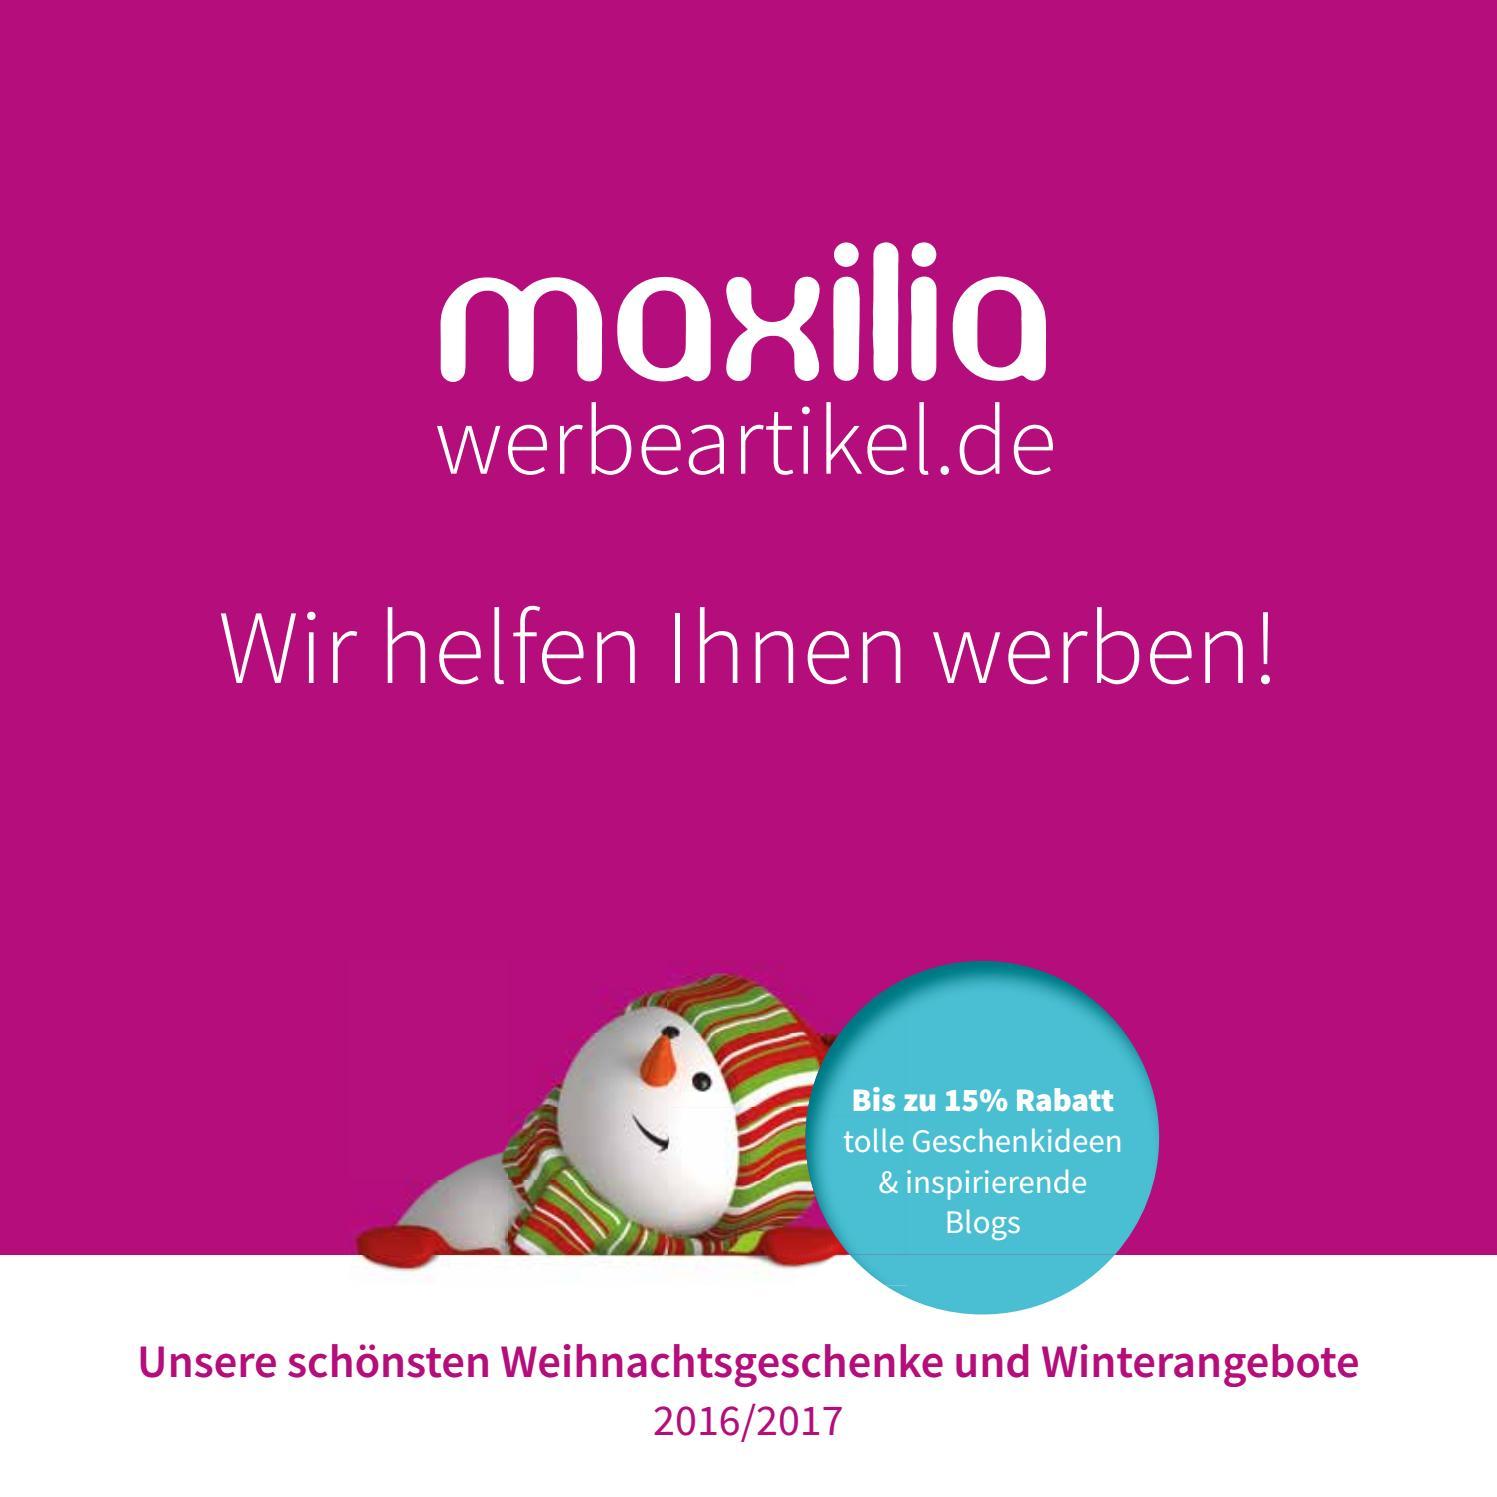 Maxilia winter katalog by Maxilia Werbeartikel GmbH - issuu